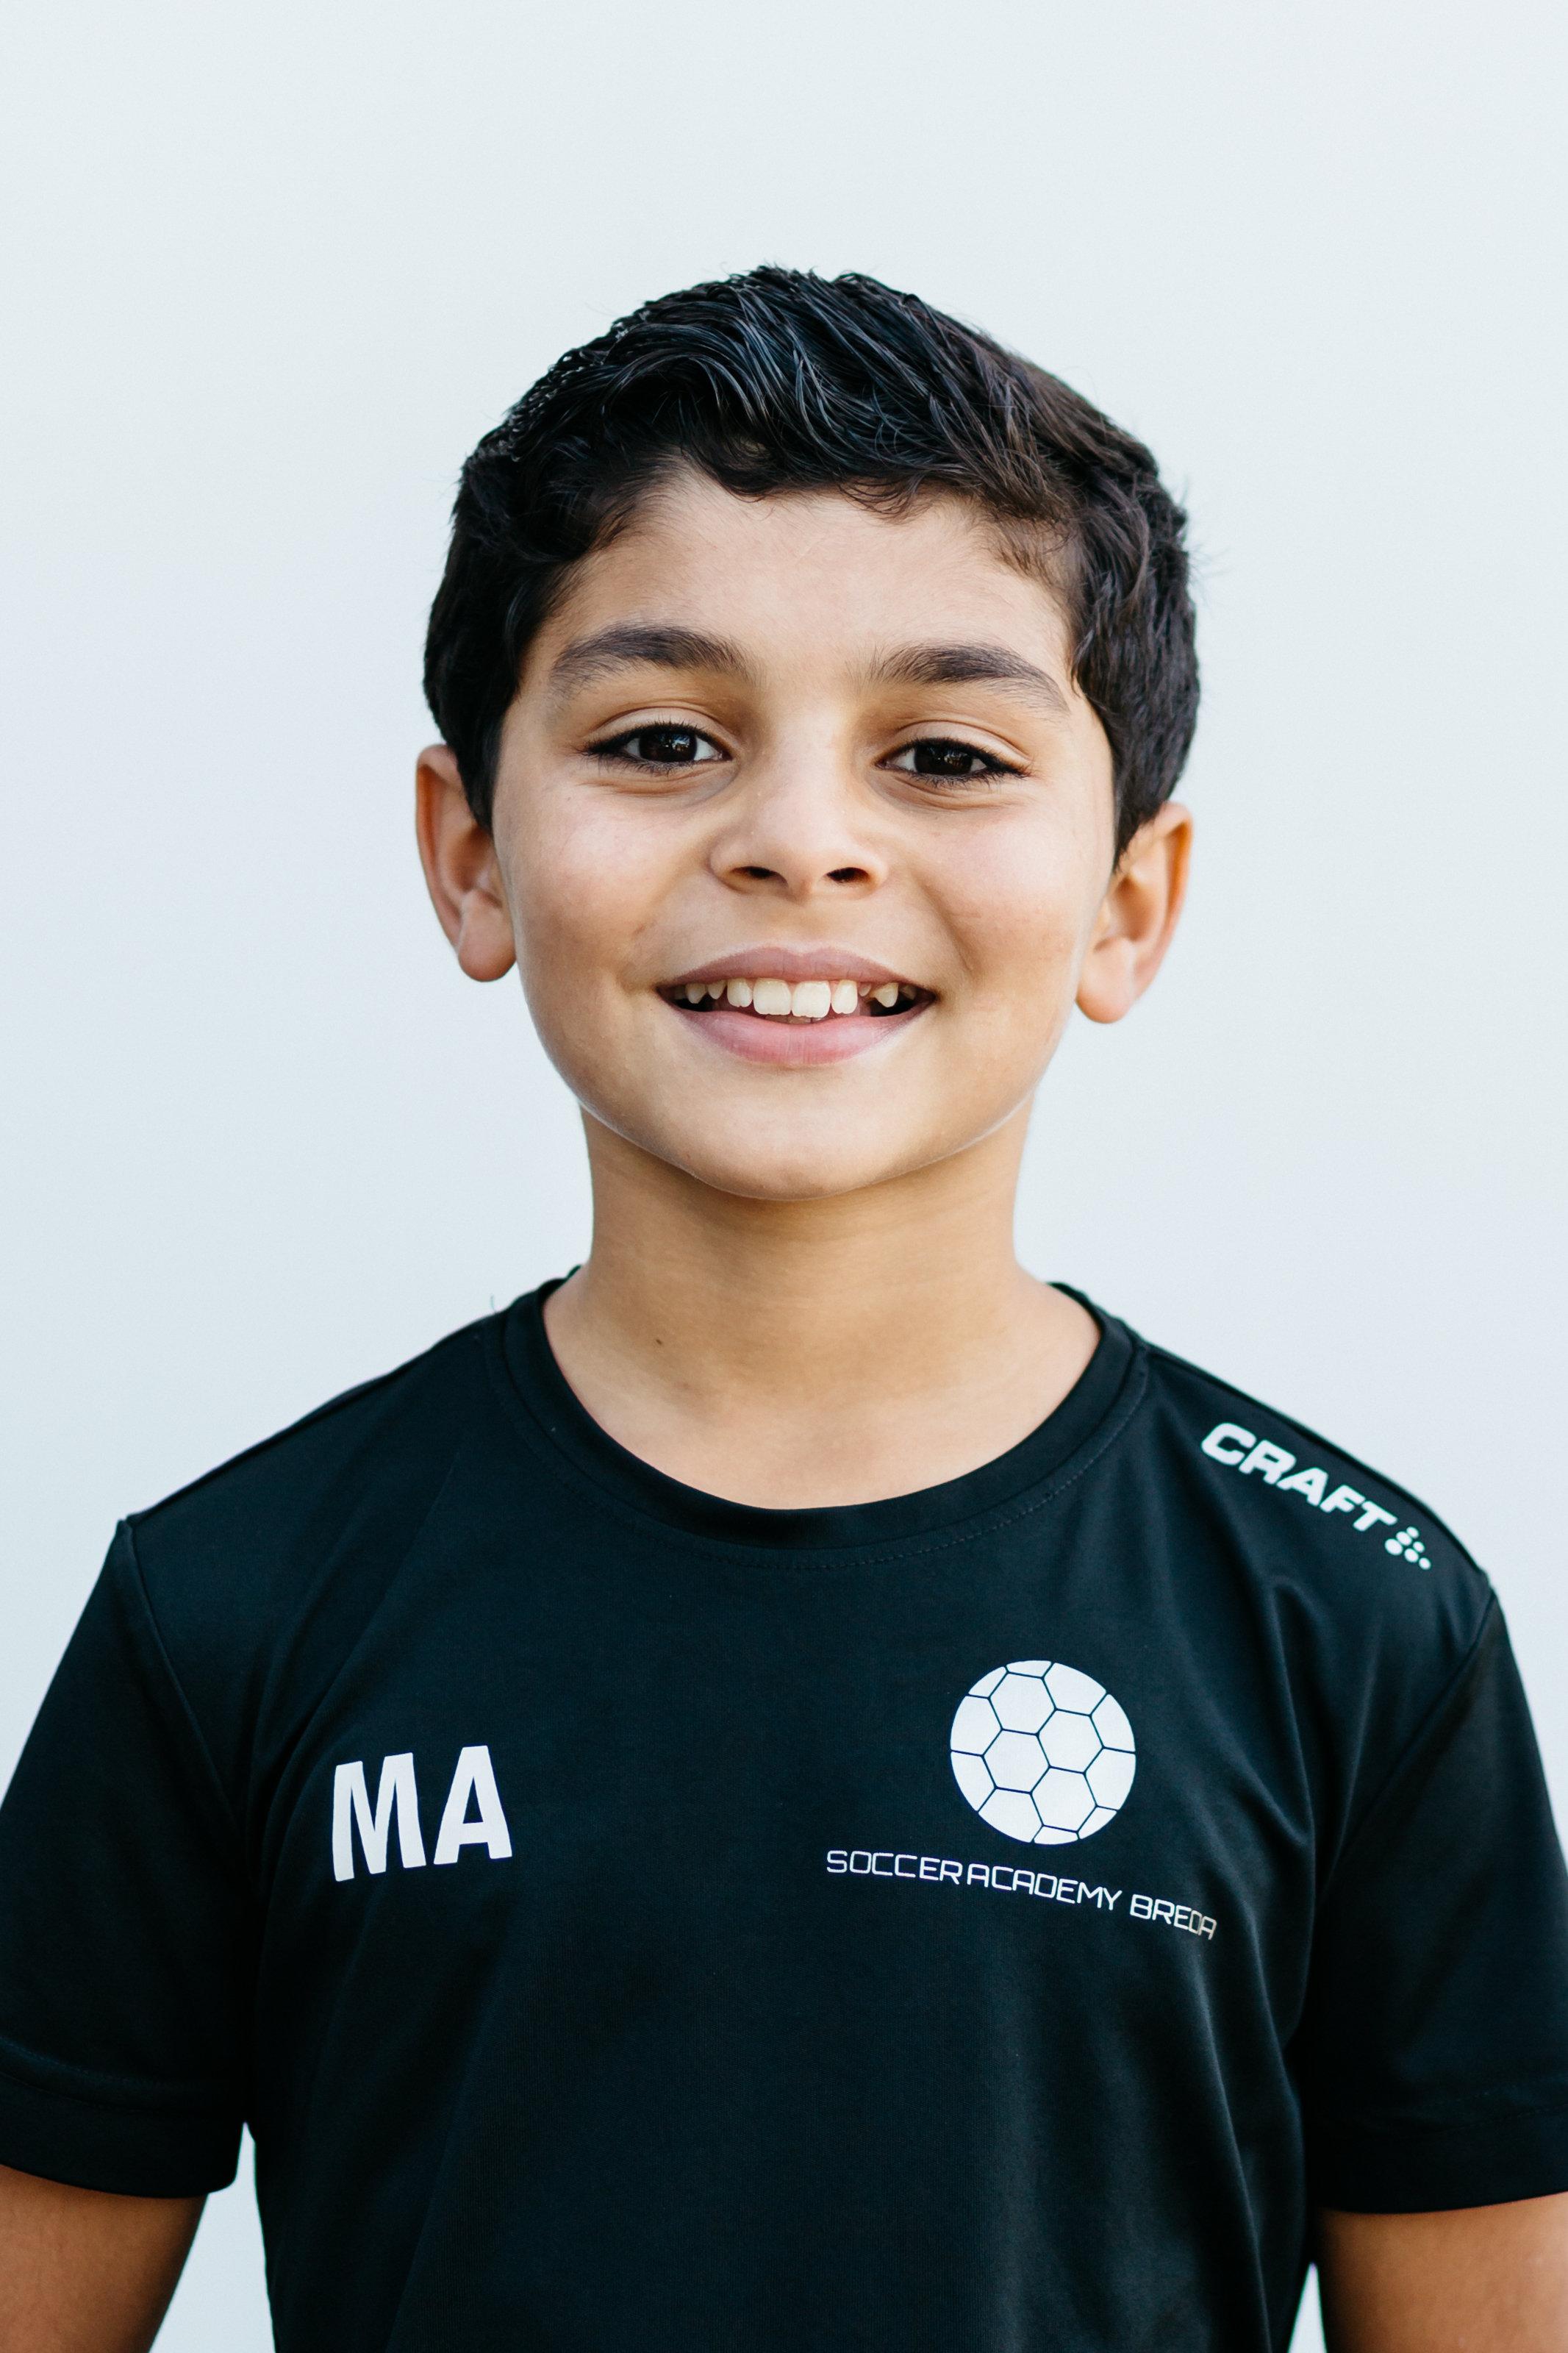 https://socceracademybreda.nl/wp-content/uploads/2020/10/mehdi-teampagina.jpg